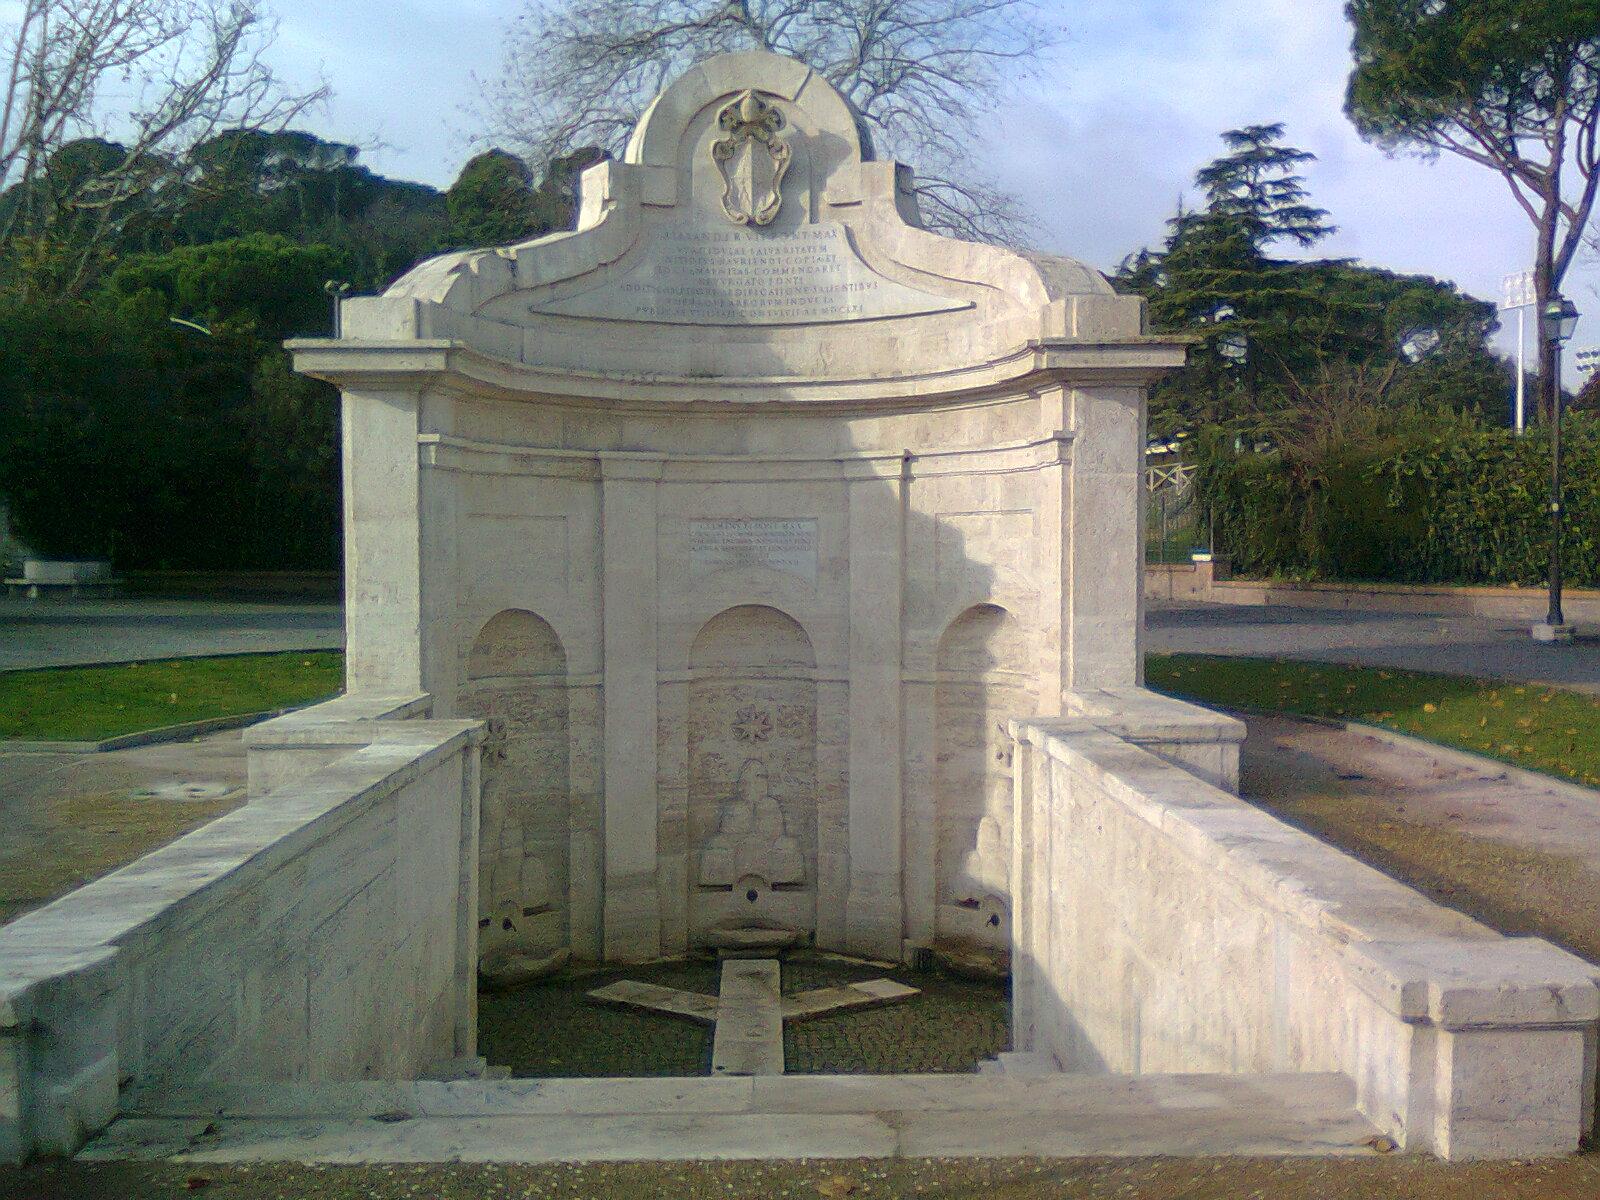 Fontana dell Acqua Acetosa